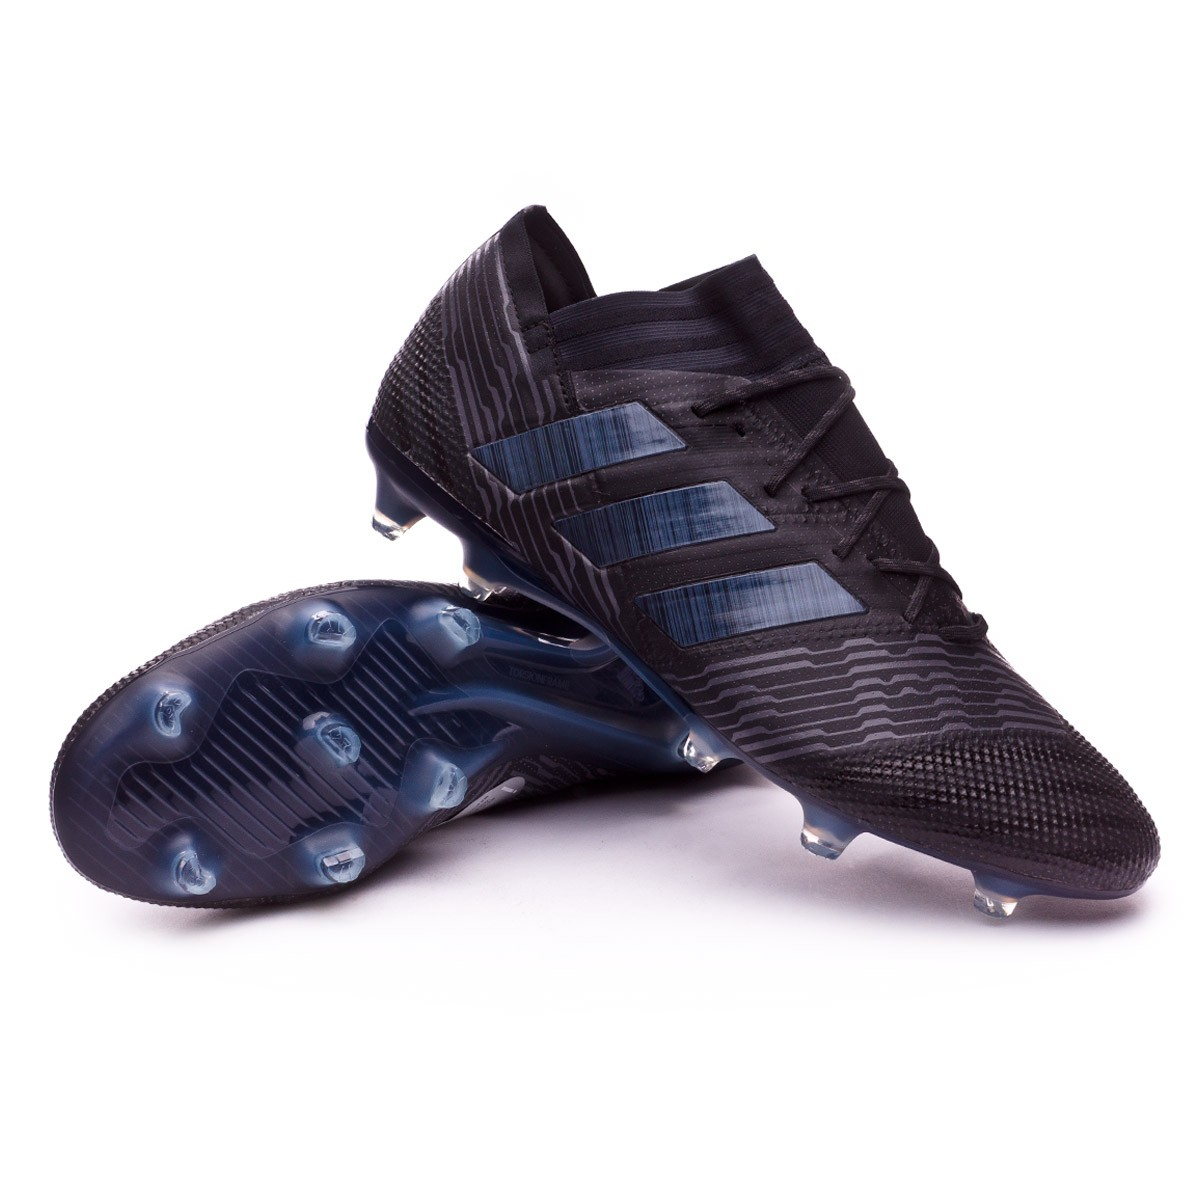 Adidas Sale Shoes India